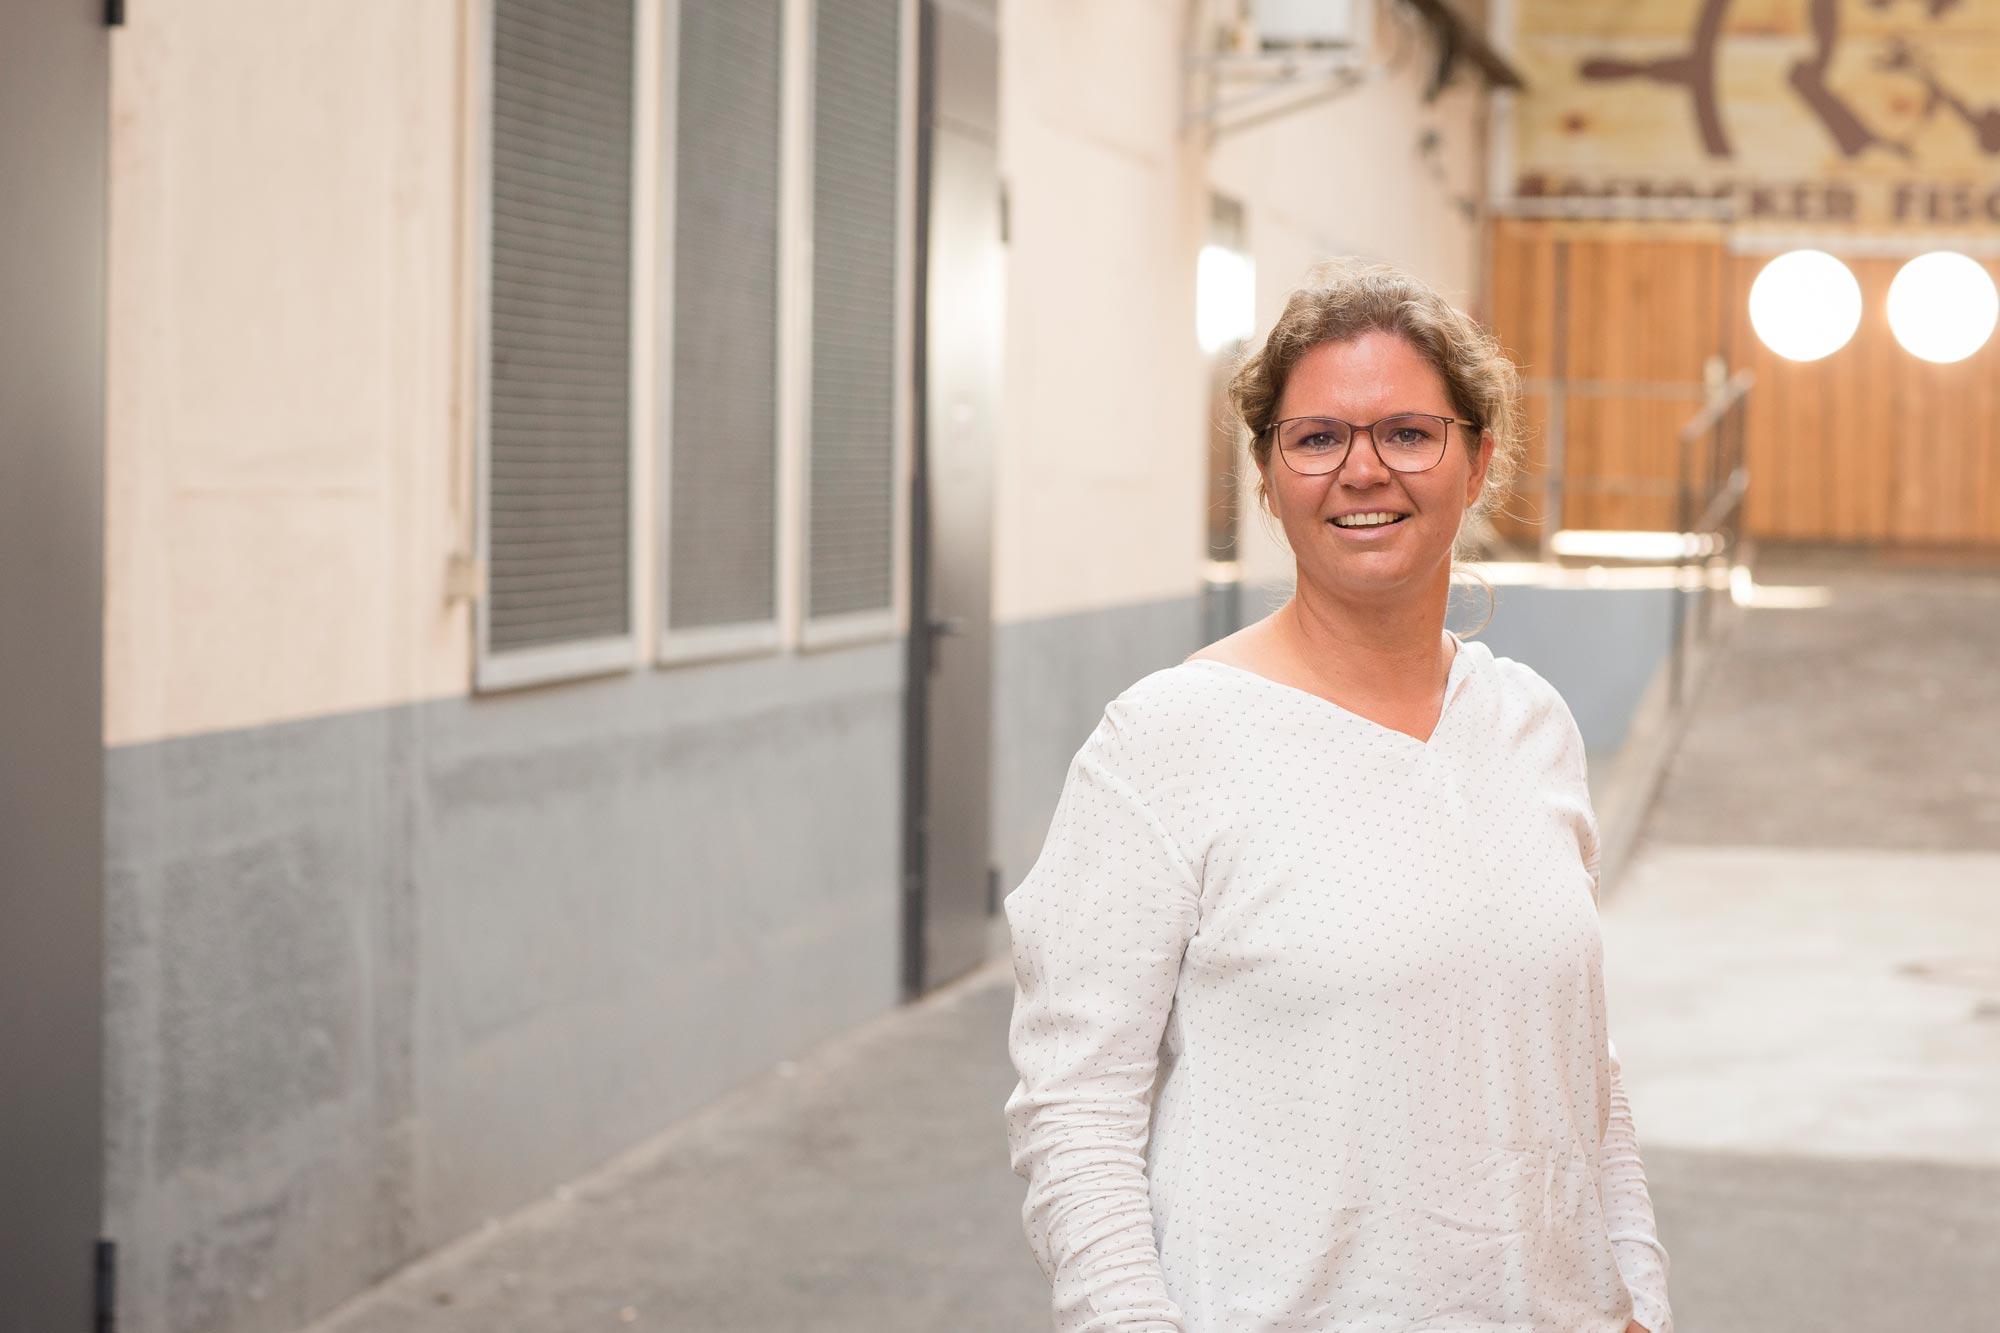 Anja Stengel ist Augenoptikerin und Kontaktlinsenspezialistin bei Optik Sagawe im Doberaner Hof